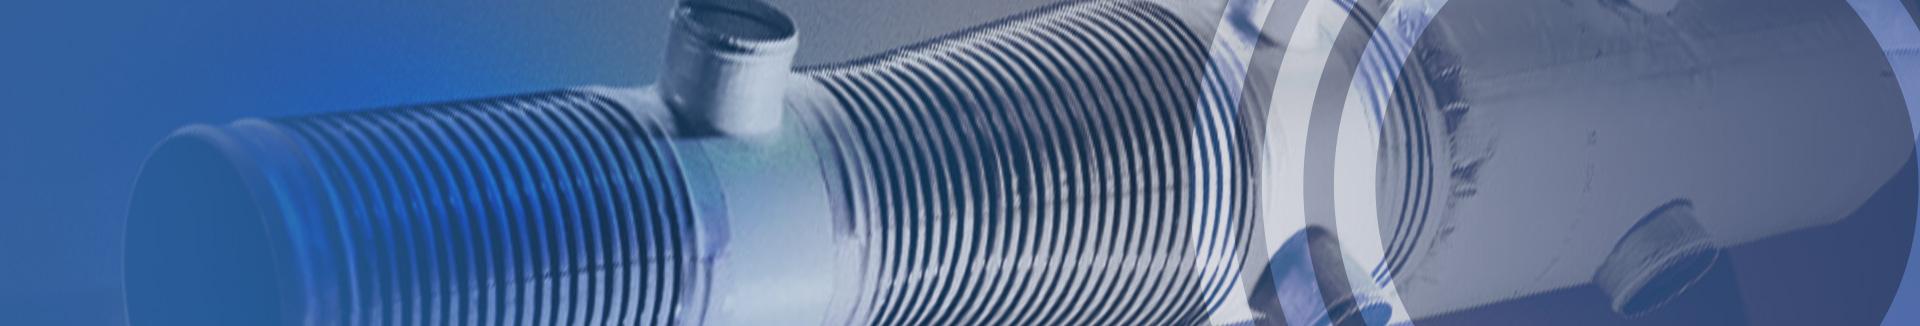 flexible-ducting